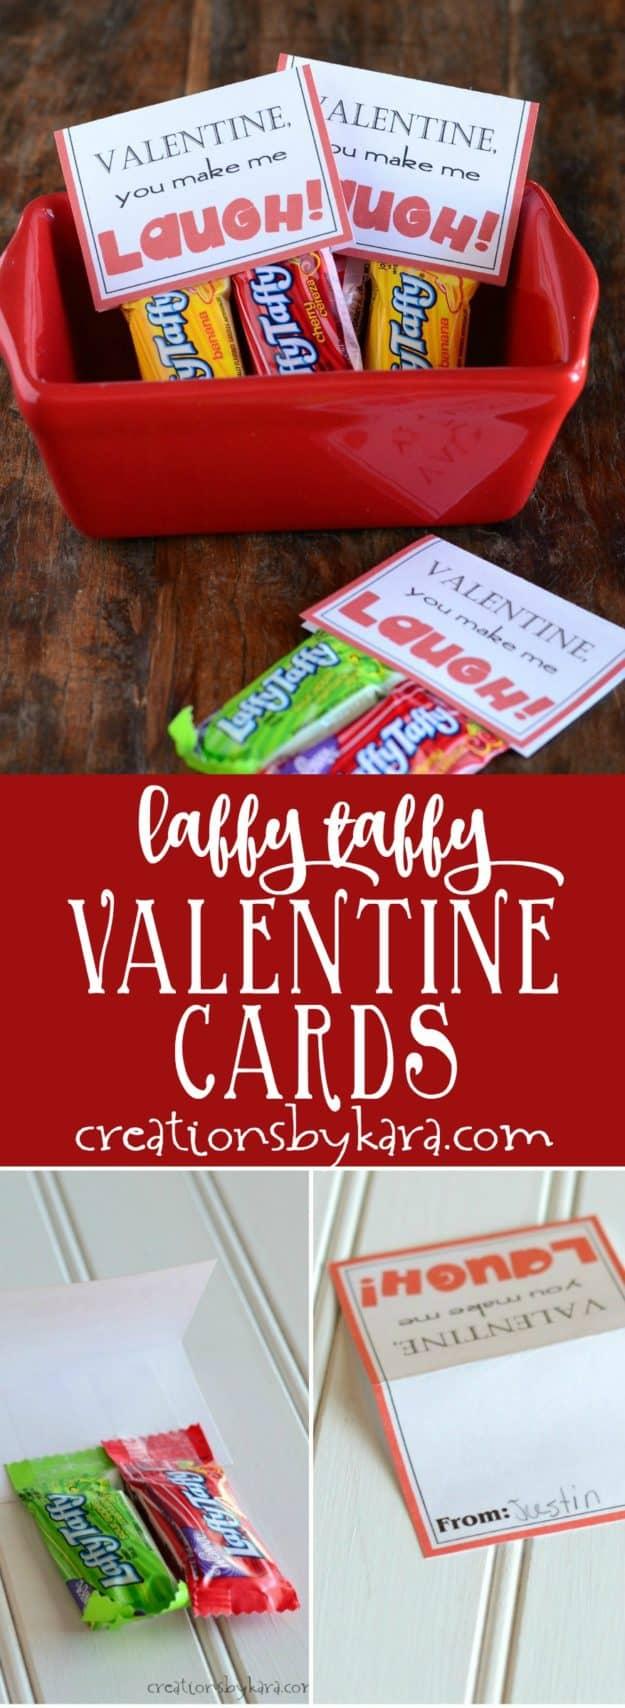 Laffy taffy printable Valentine cards